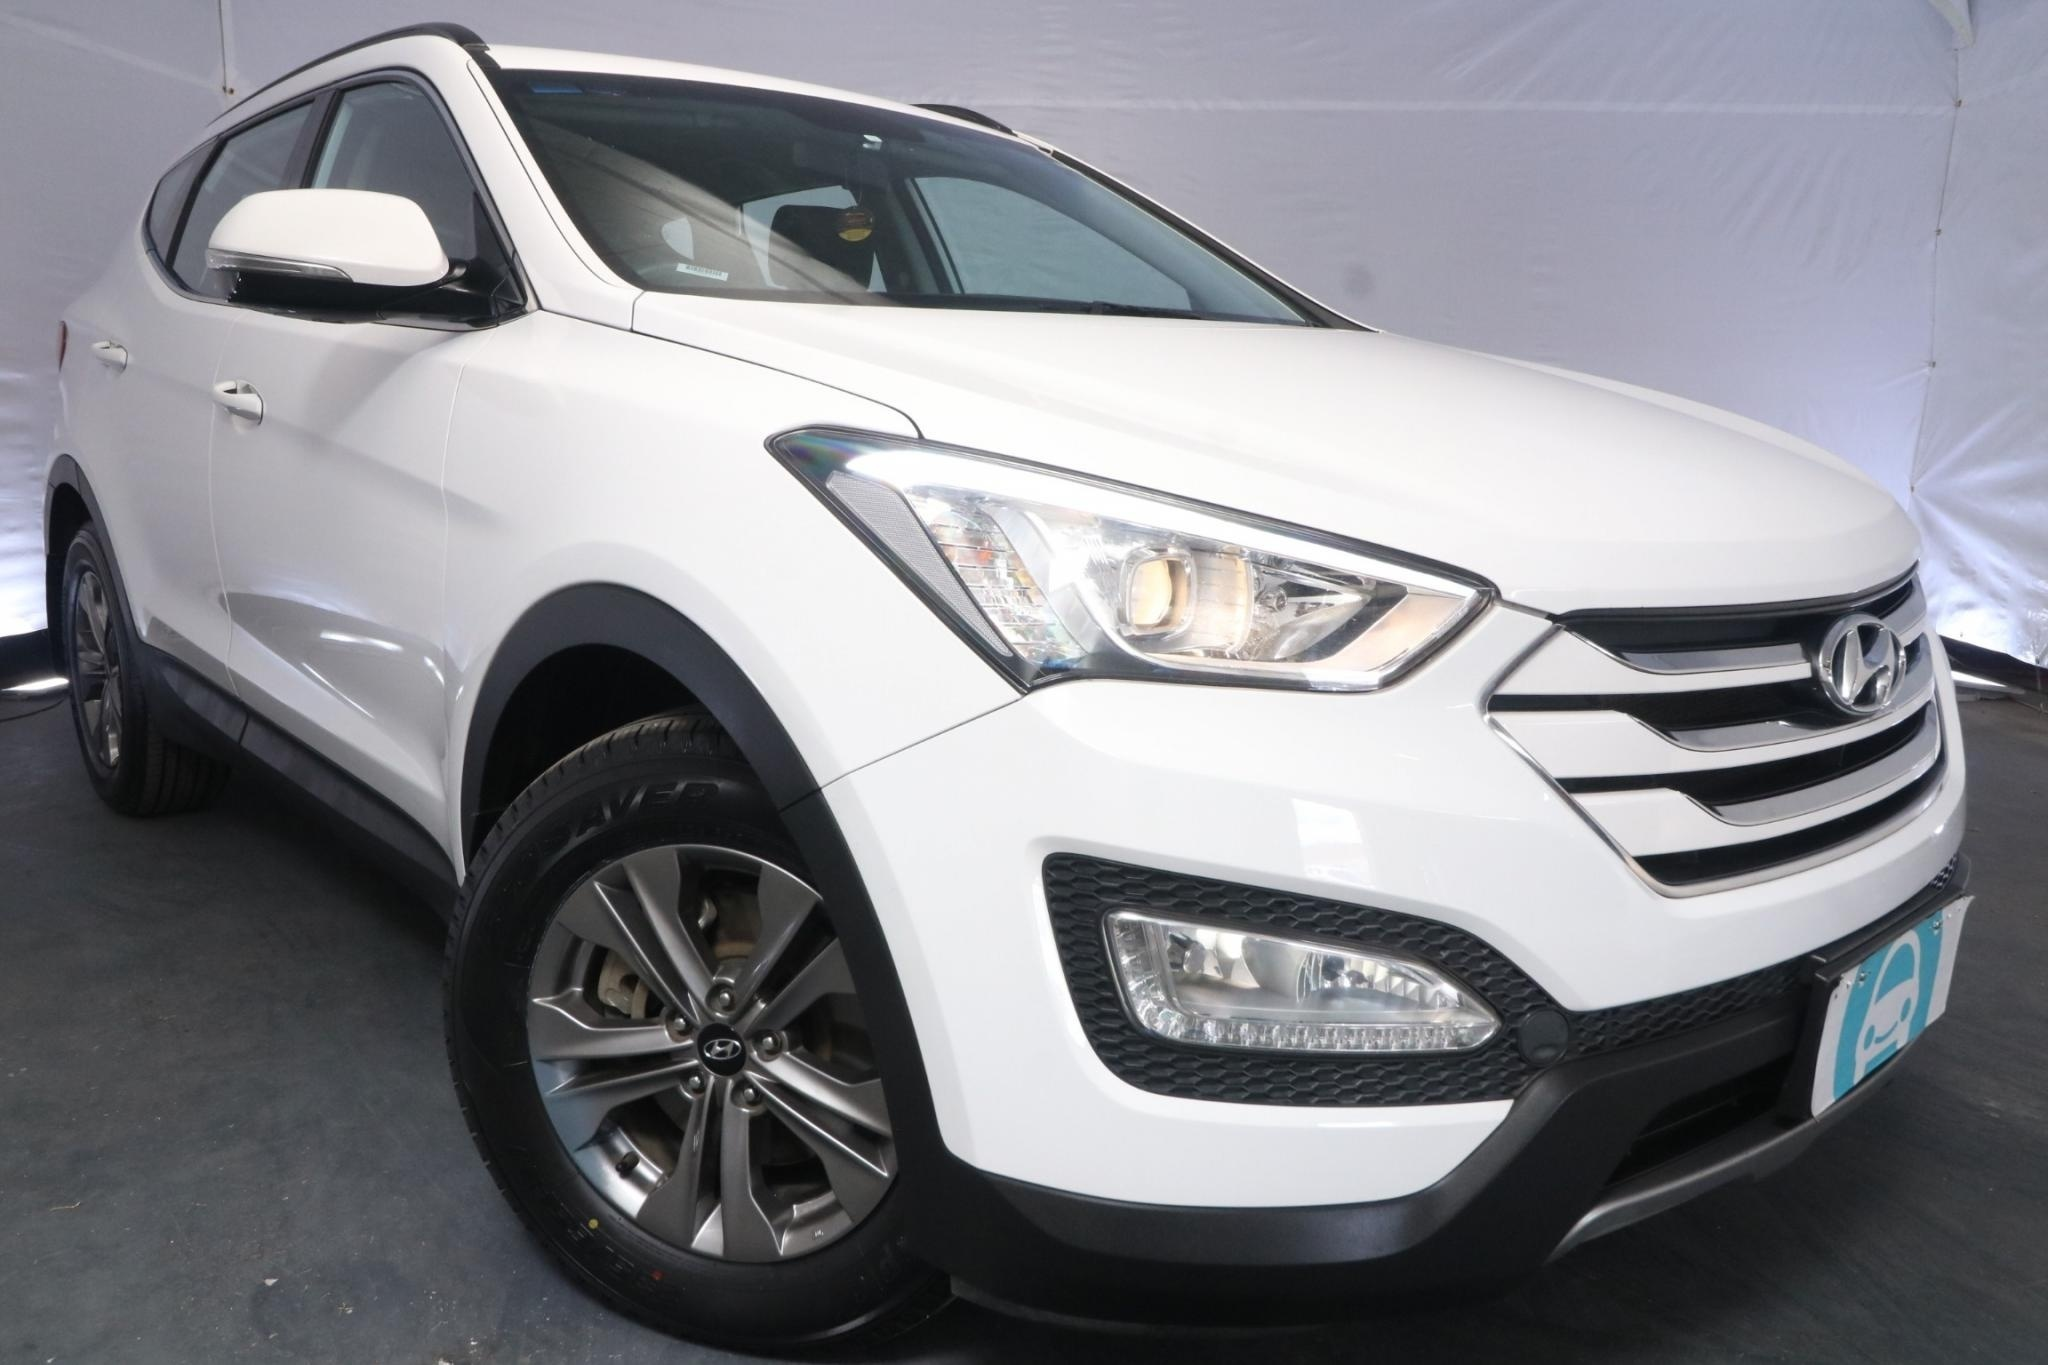 2015 Hyundai Santa Fe ACTIVE DM MY15 / 6 Speed Automatic / Wagon / 2.4L / 4 Cylinder / Petrol / 4x4 / 4 door / Model Year '15 September release RLH15A